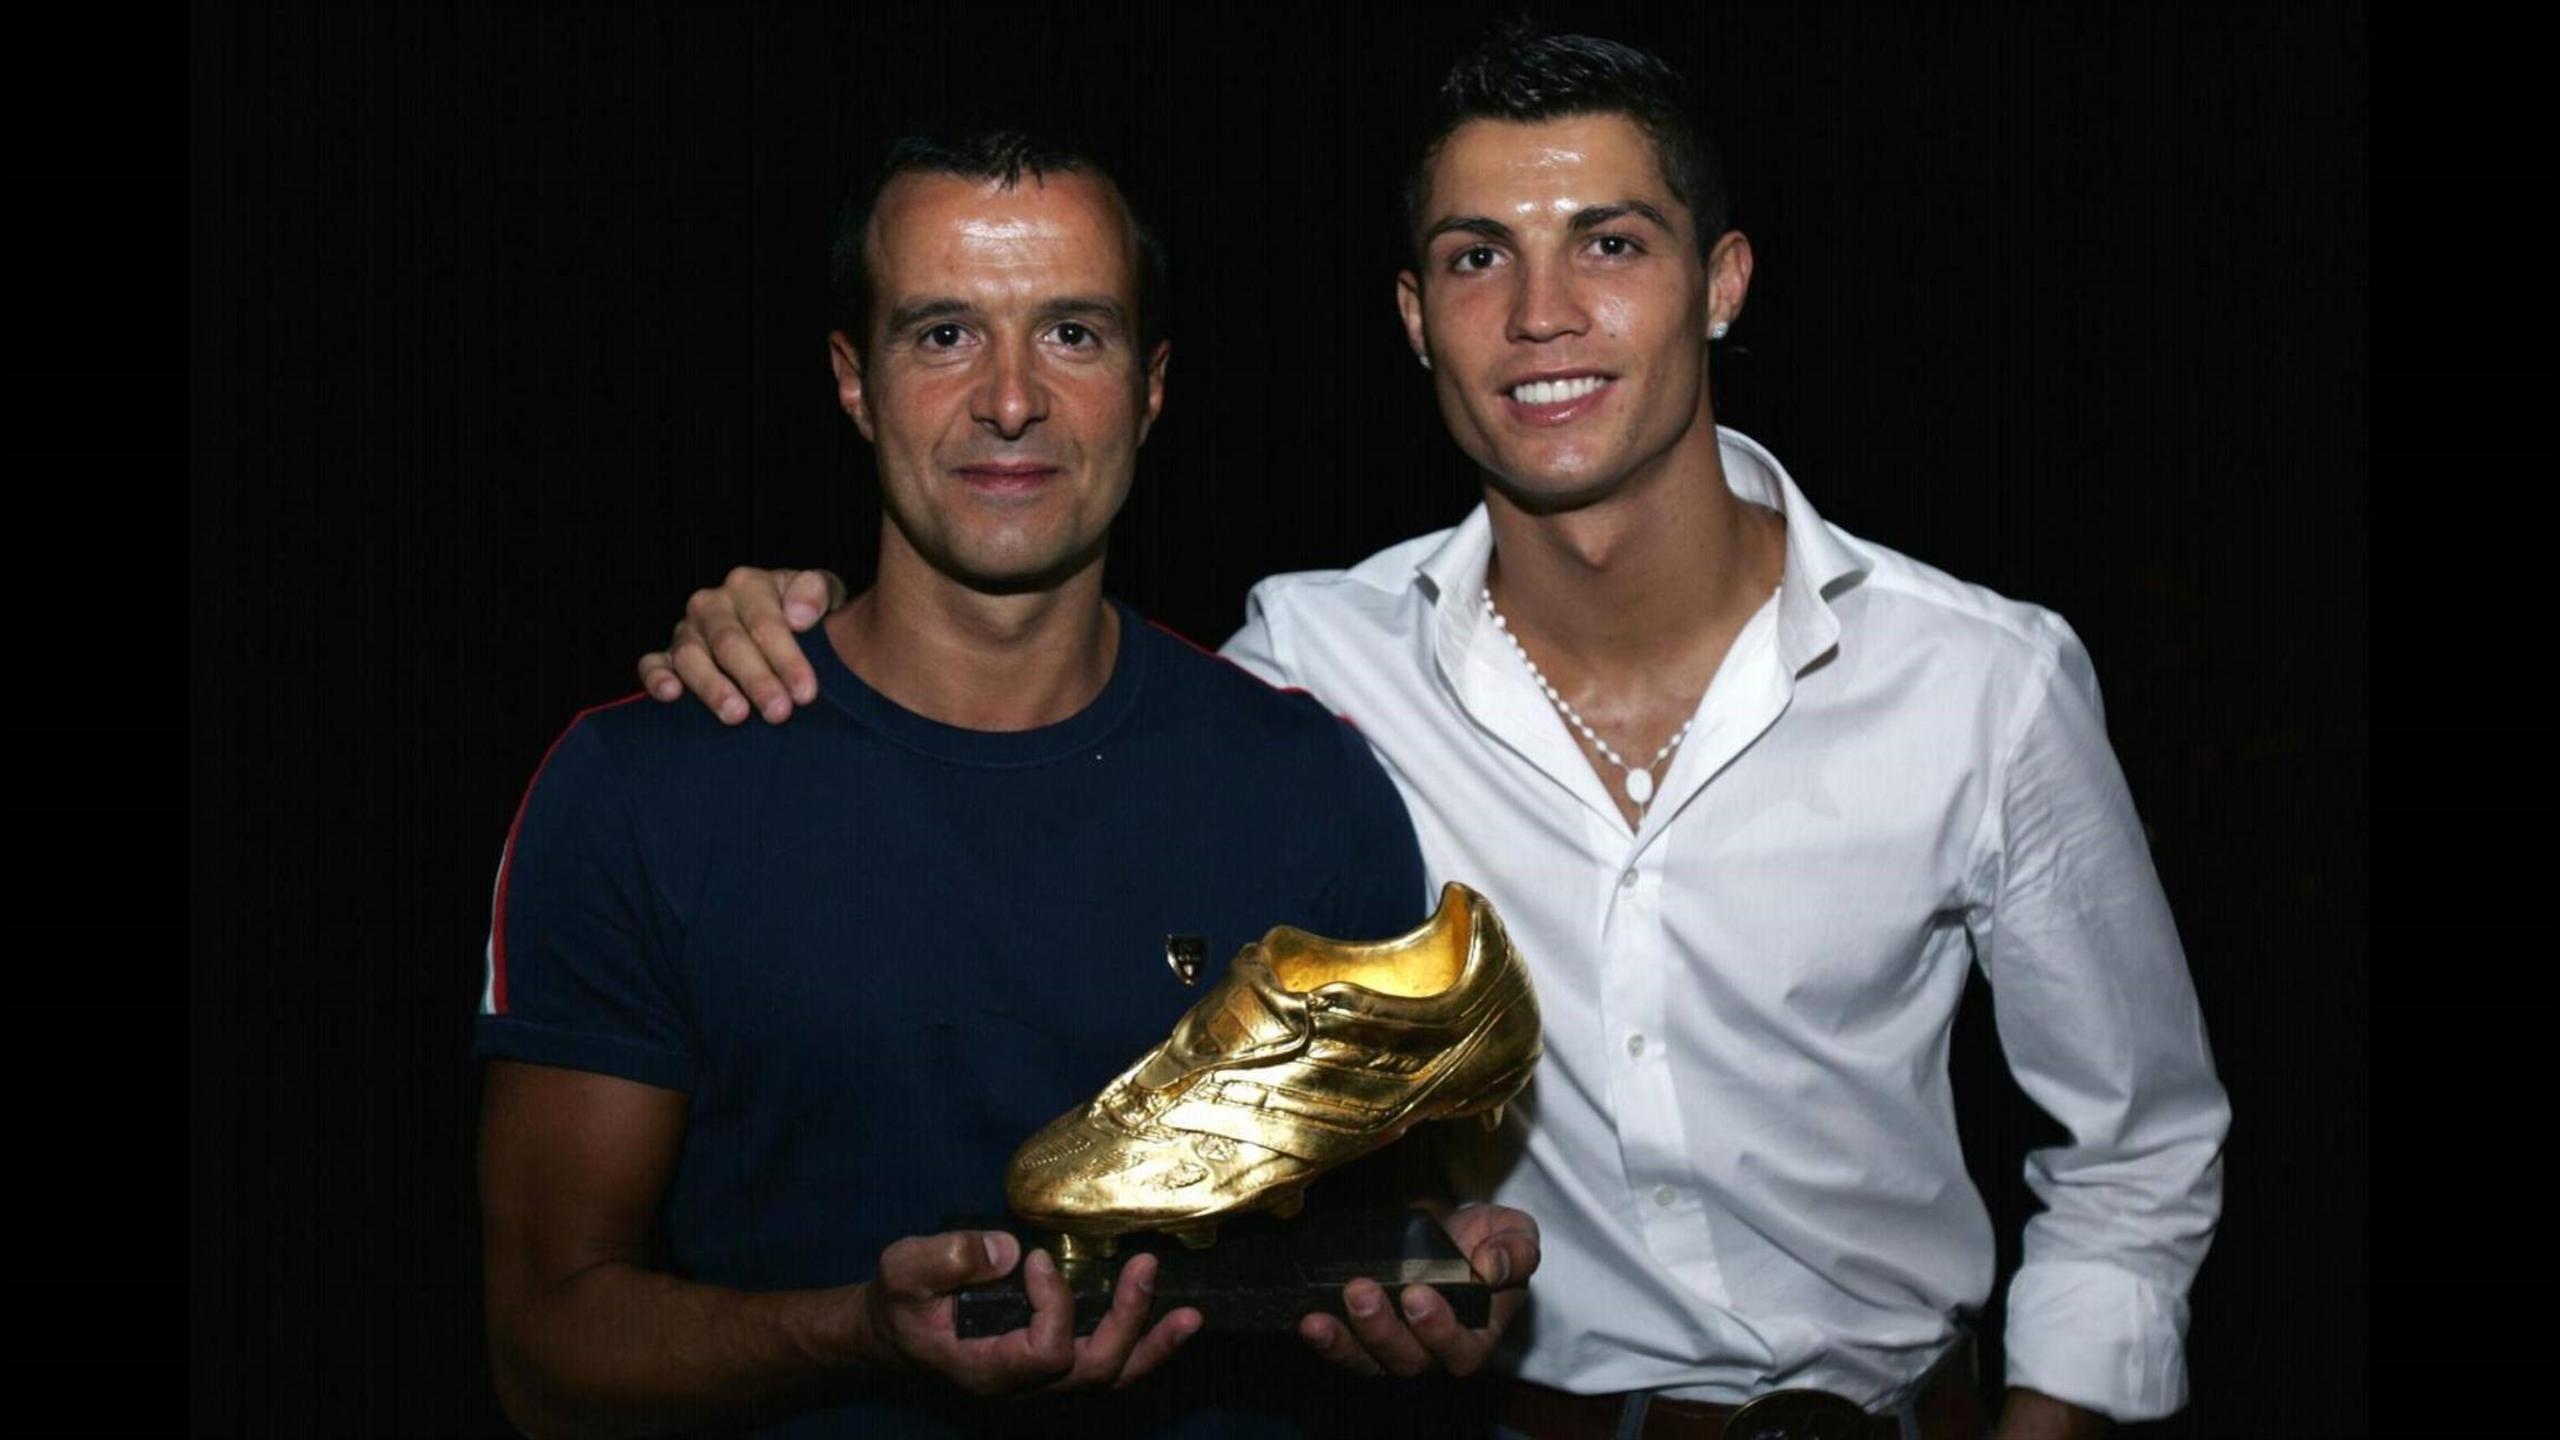 Jorge Mendes, Cristiano Ronaldo (imago NOT in POR, FRA, BRA)